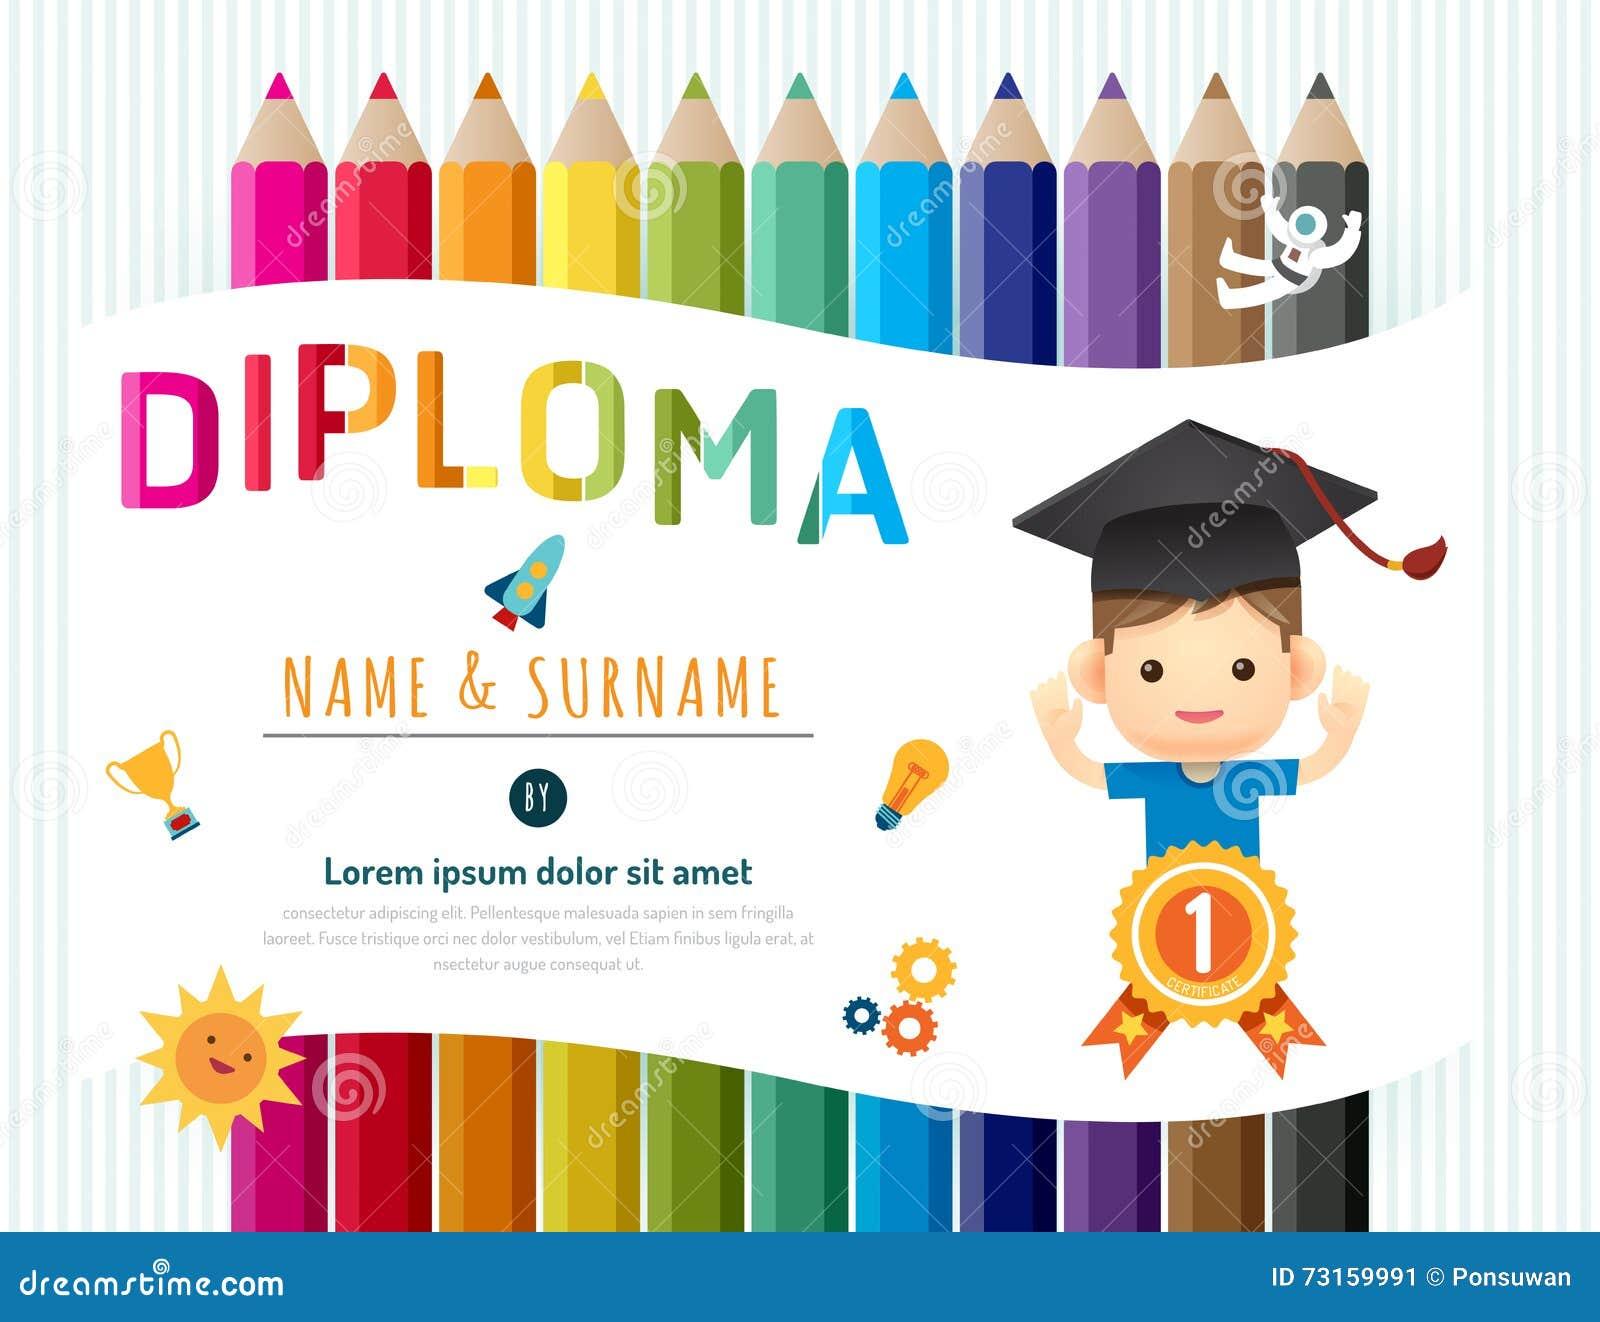 Certificate kids diploma kindergarten template layout stock certificate kids diploma kindergarten template layout stock image yadclub Gallery